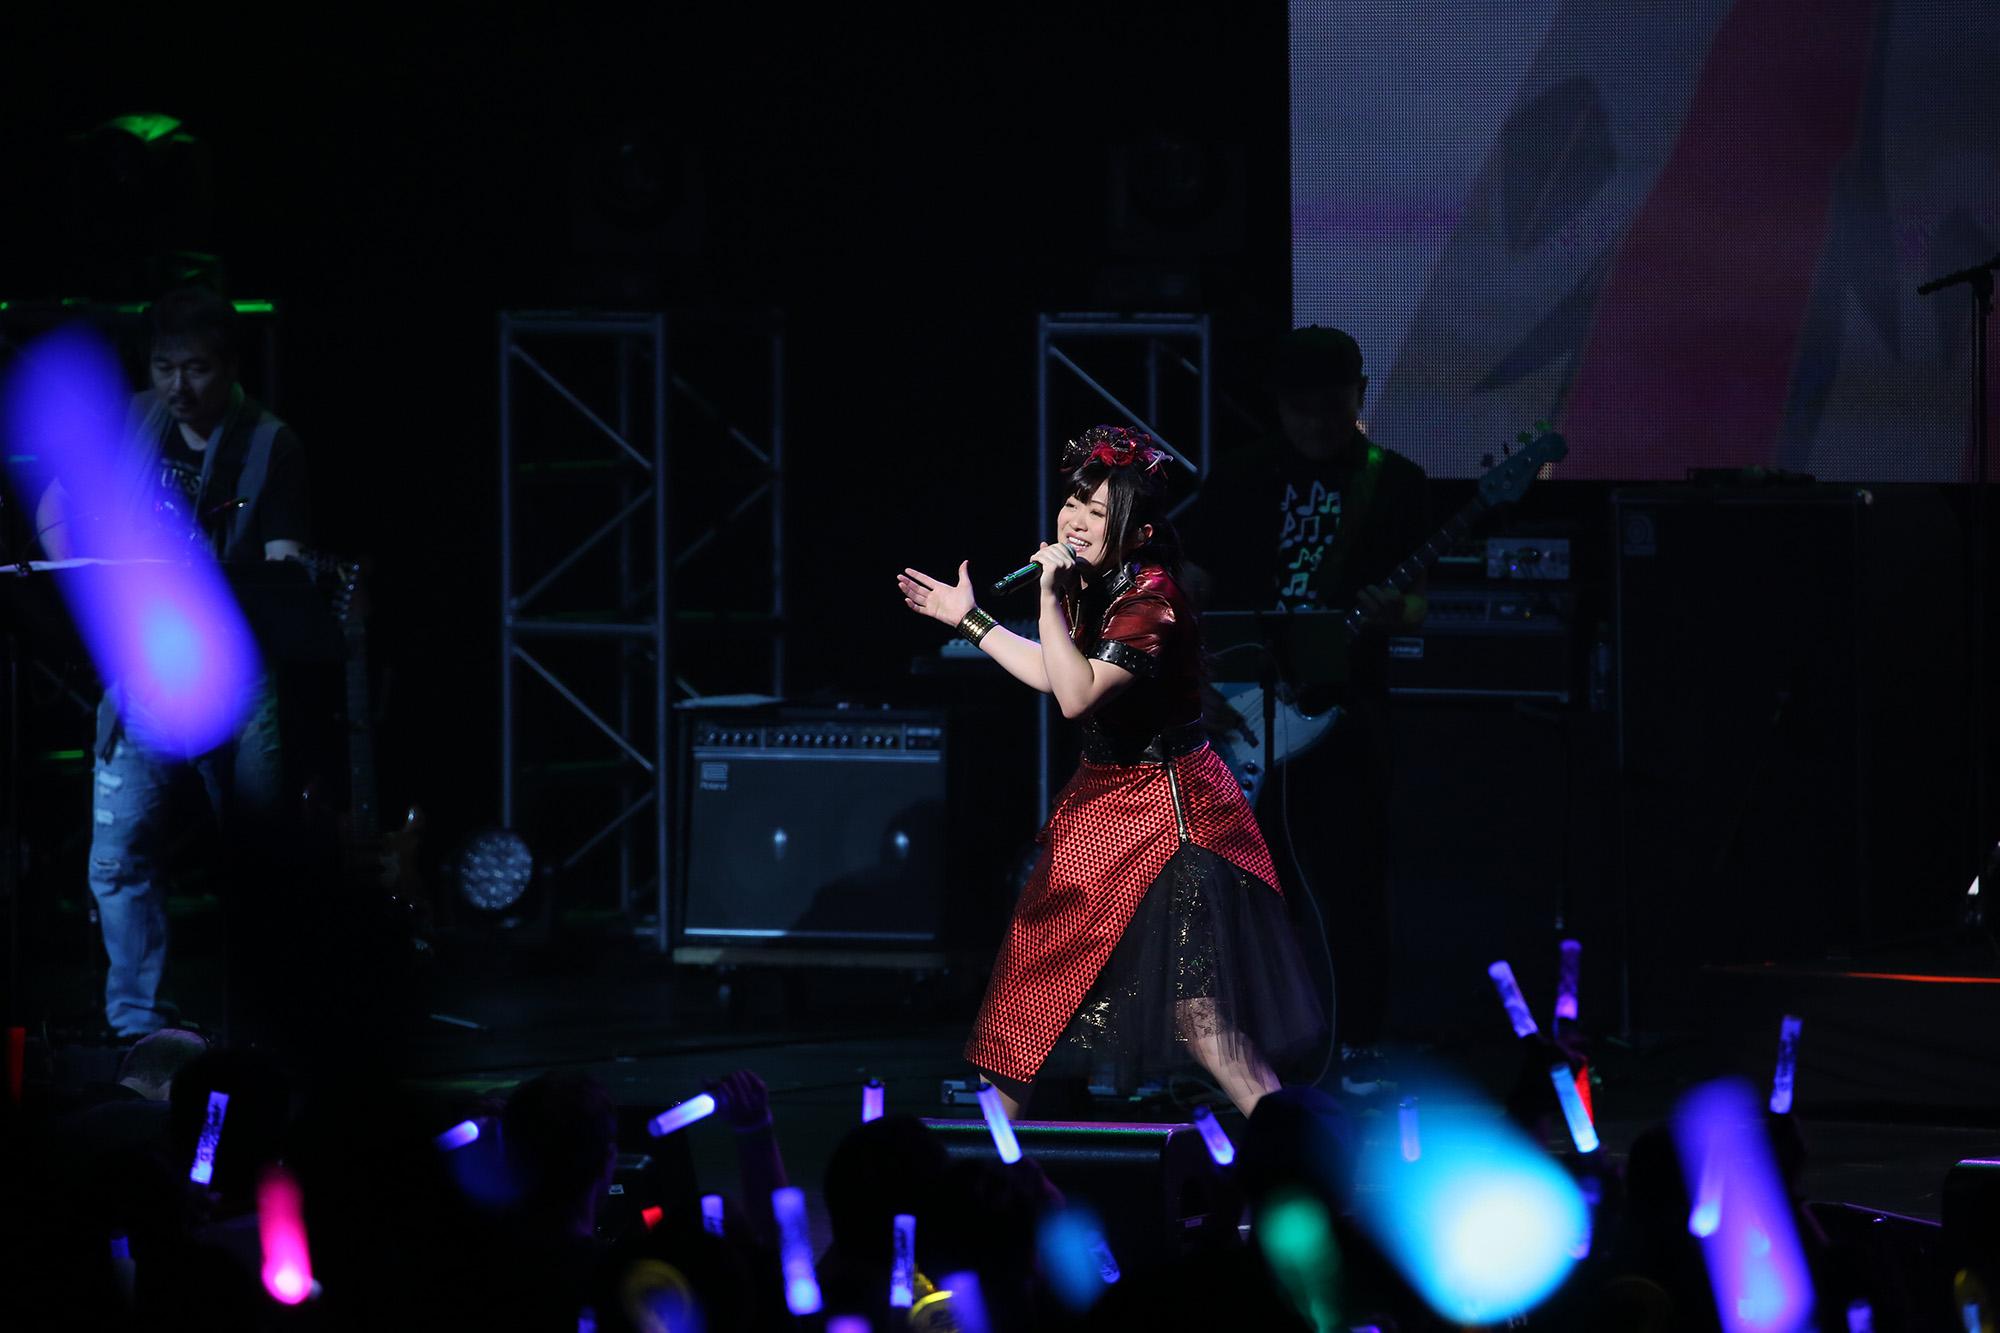 RMMS-AWMAX17-Konomi-Suzuki-2017-07-01-2015